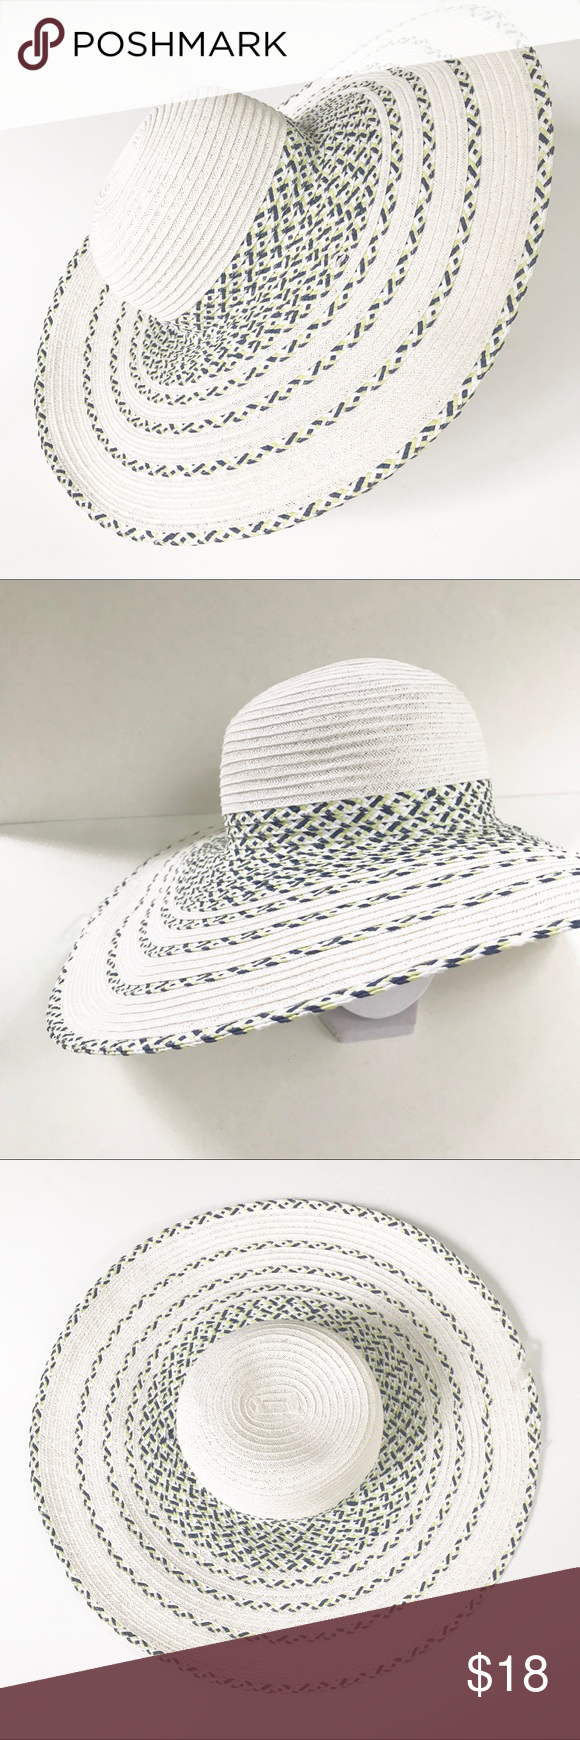 Nwt Packable Large Brim Floppy Straw Like Hat Accessories Hats Fashion Design Brim